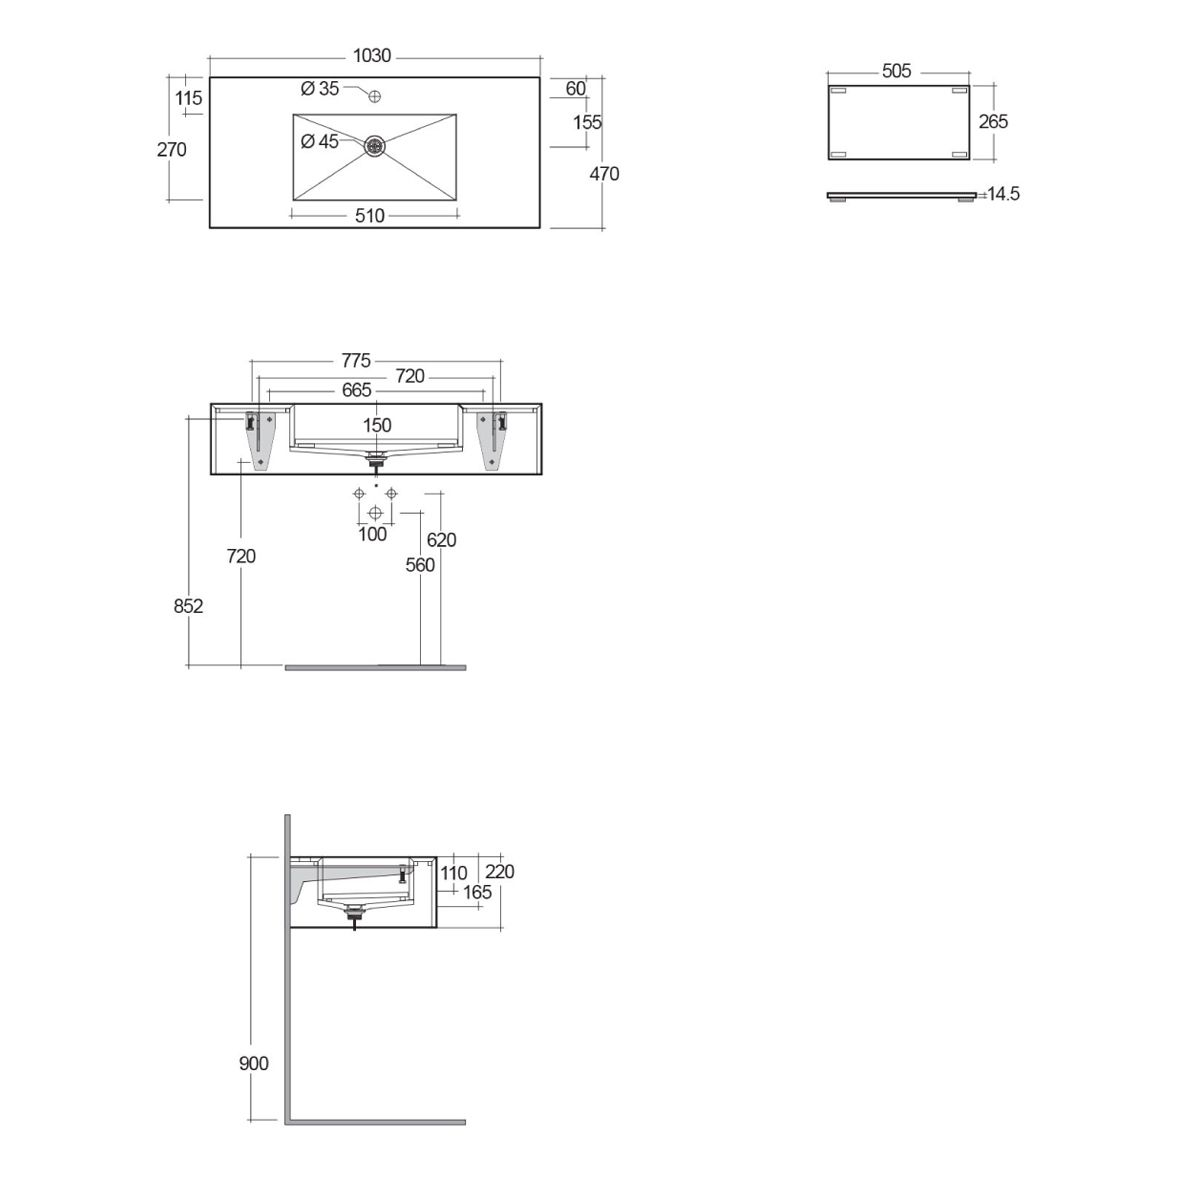 RAK Precious Surface Cool Grey Wall Hung Counter Basin 1000mm with Brackets Measurements